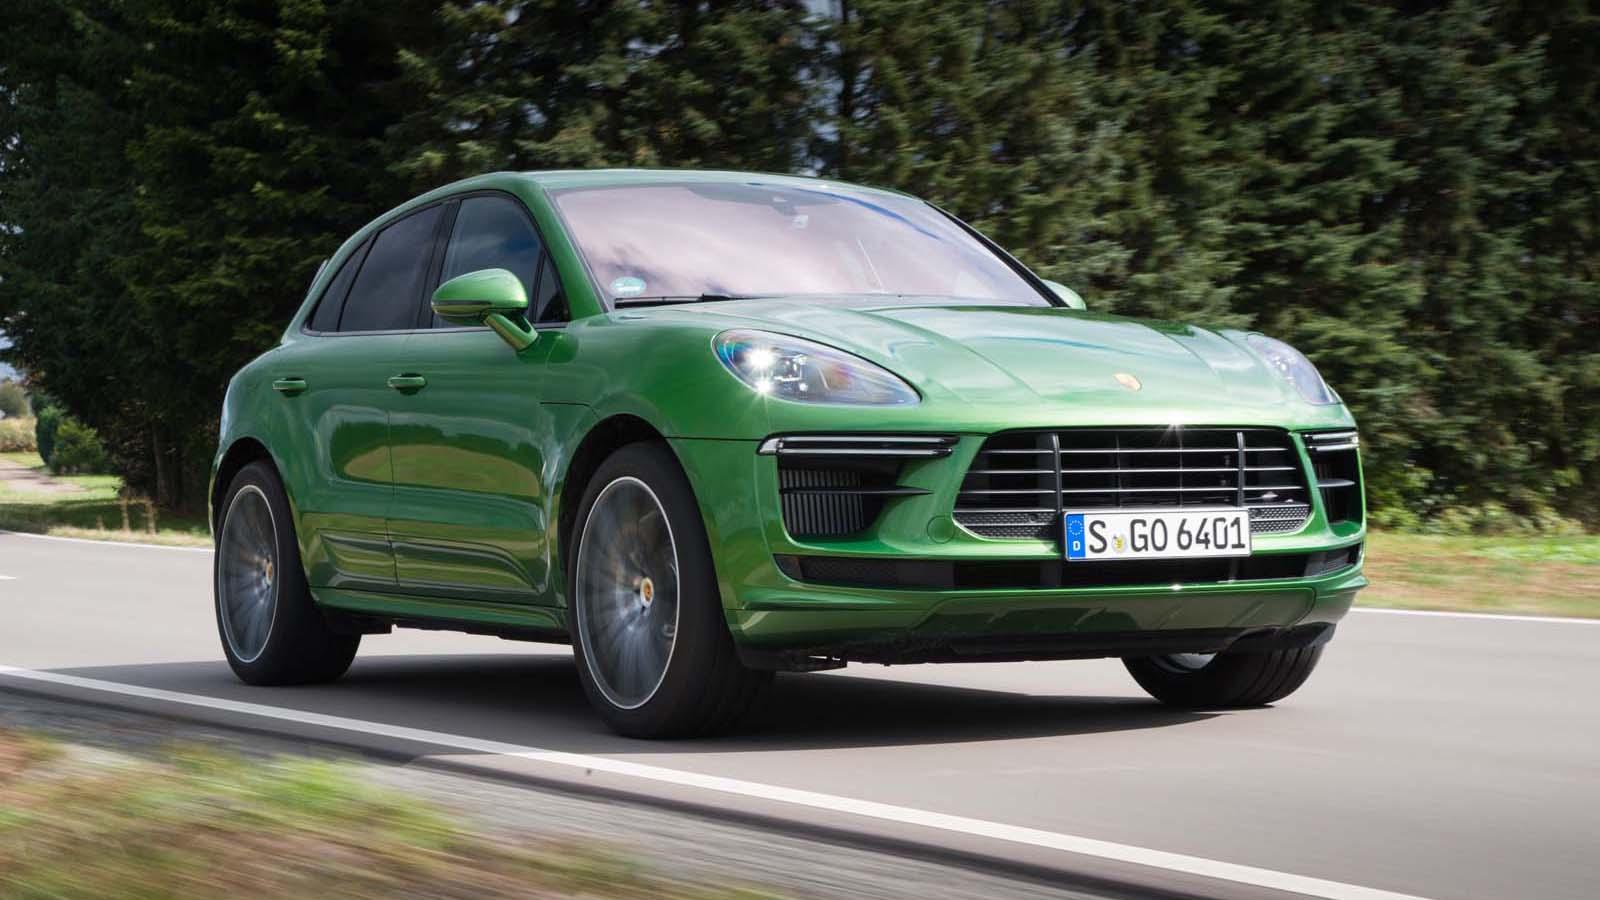 2020 Porsche Macan Turbo First Drive Review Absolutely Stellar